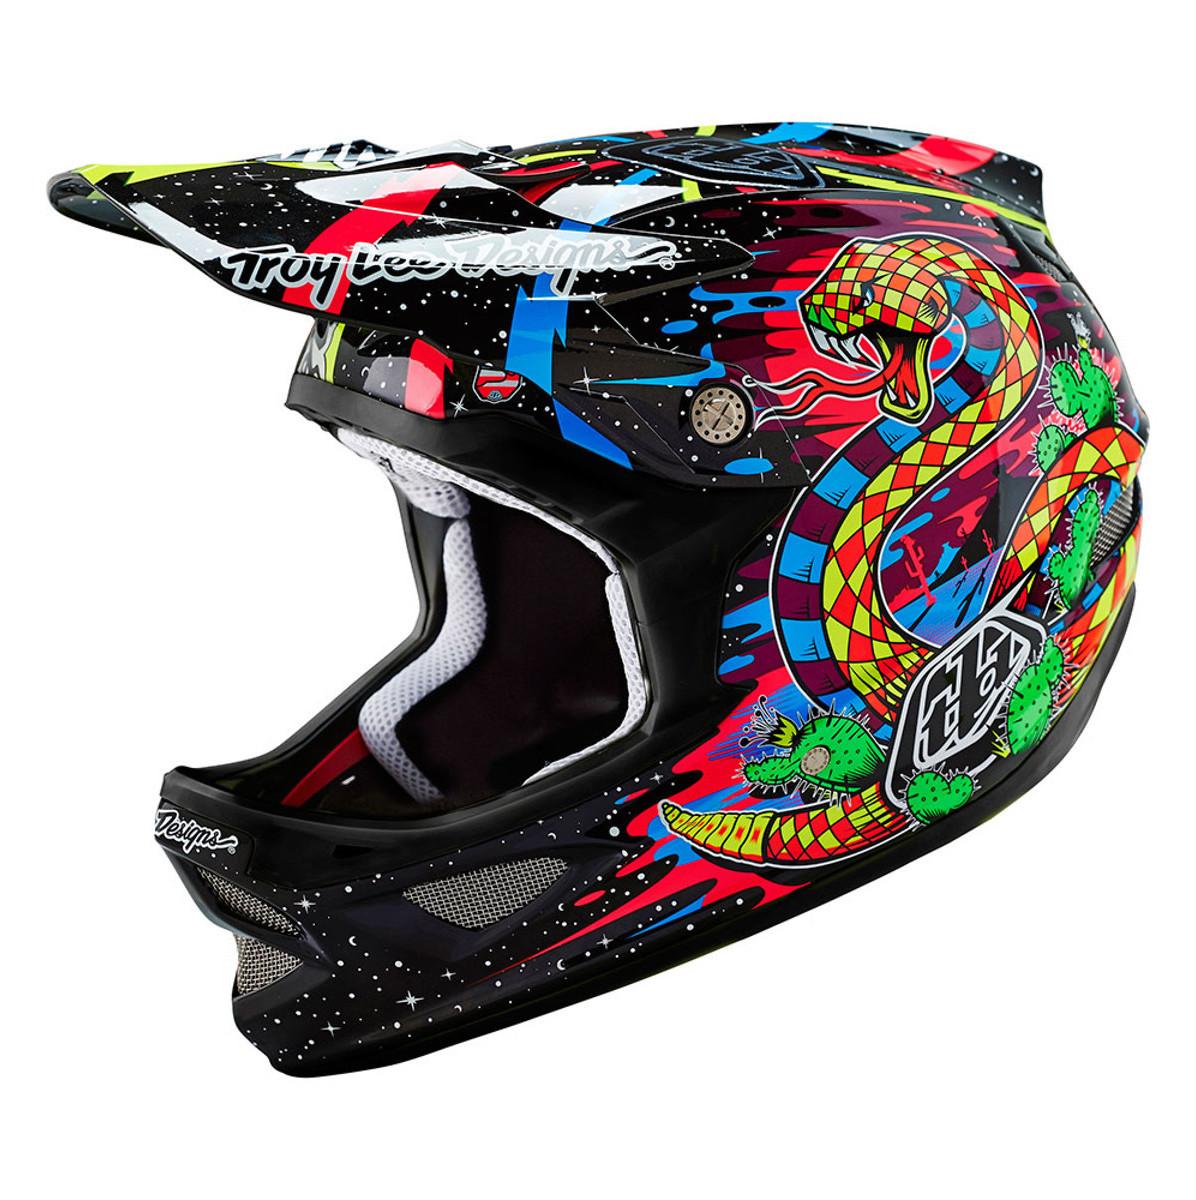 Troy Lee Designs D3 Carbon Full Face Helmet Reviews